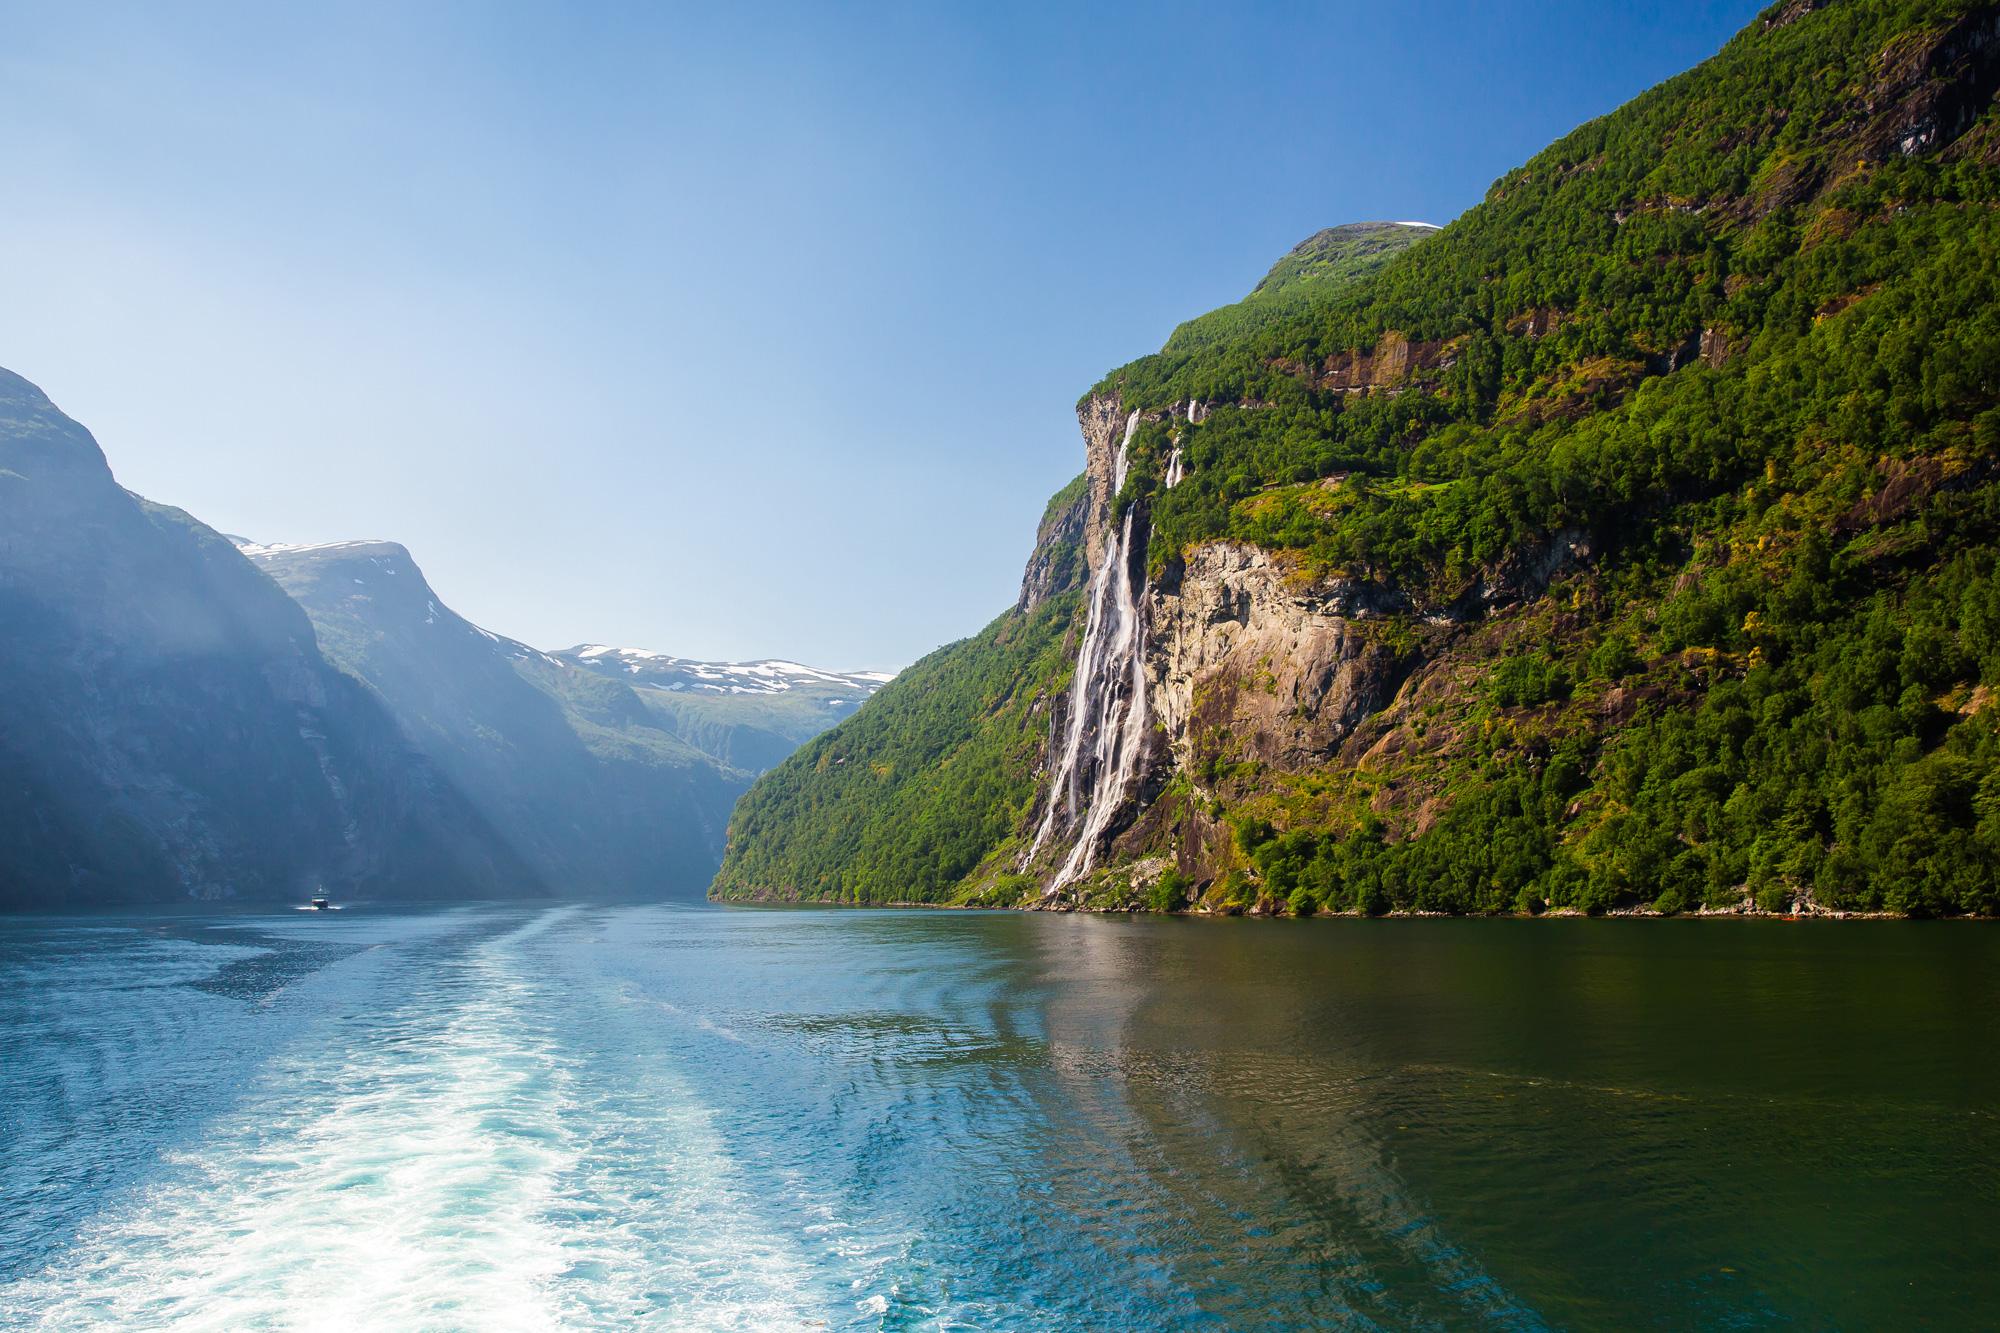 norway fjords seven sisters falls geirangerfjord istk